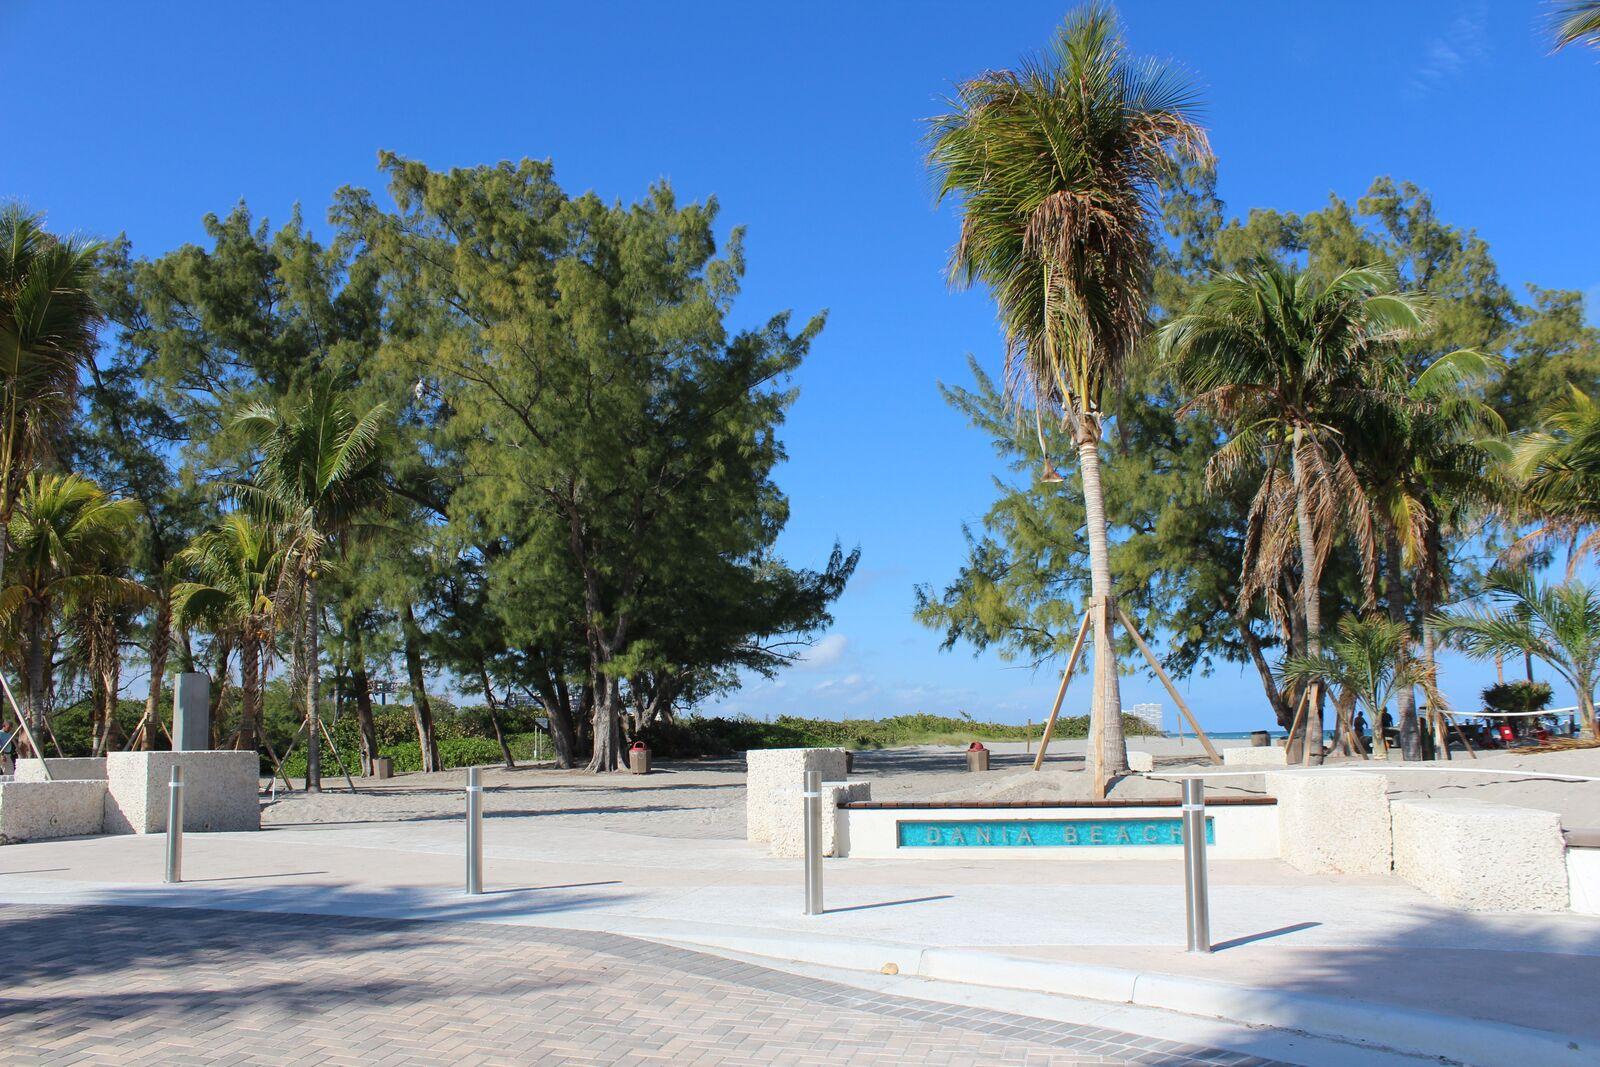 Palm Tree Near Walk Way.jpg